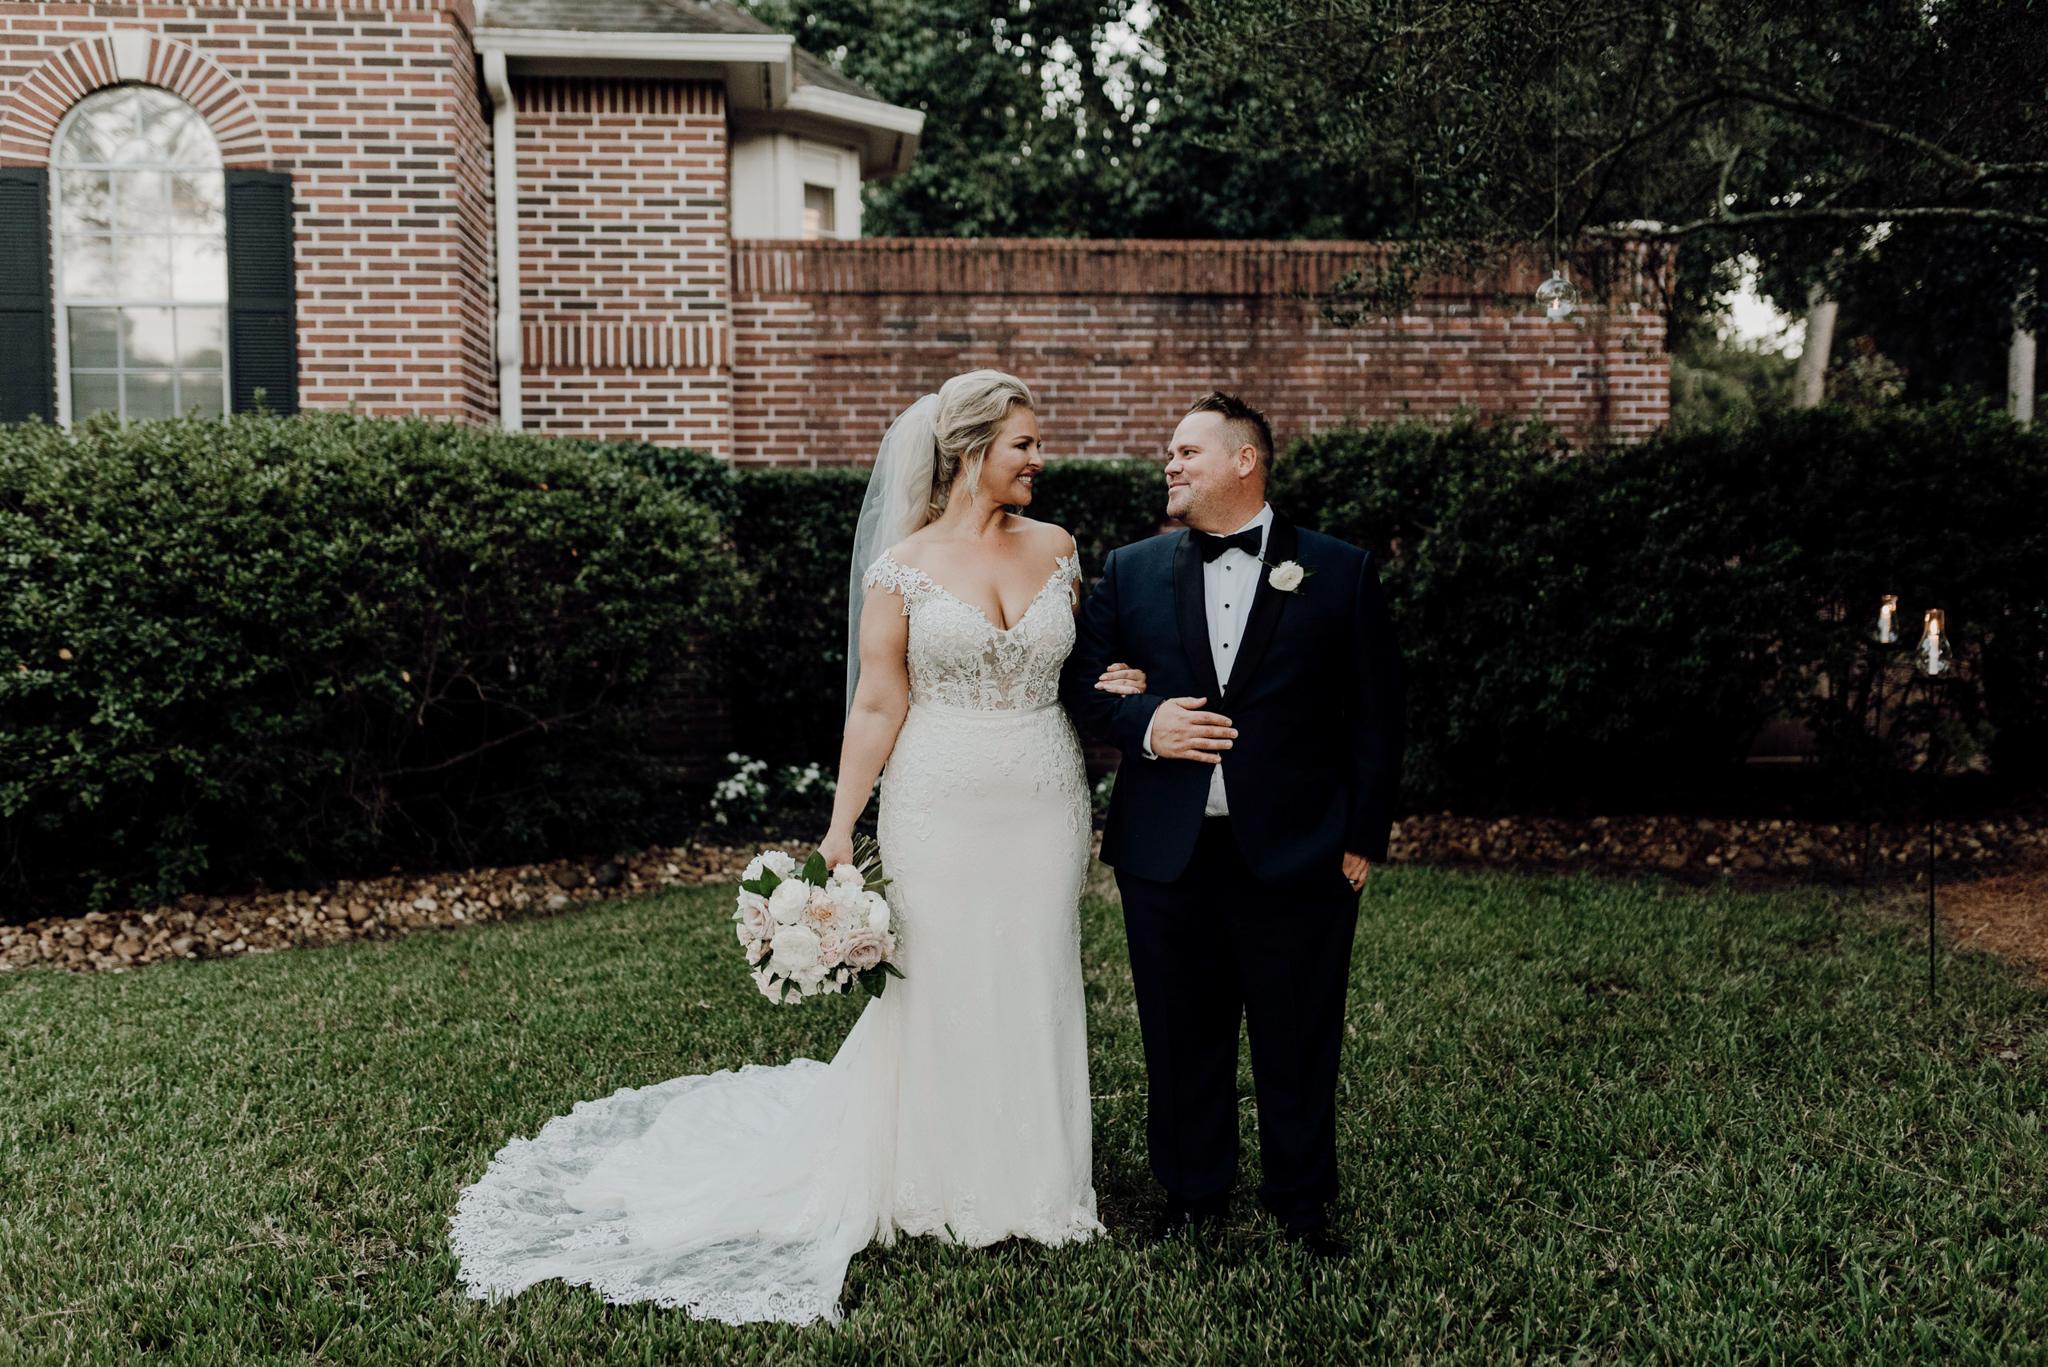 Houston Wedding Photographer-Intimate Texas Backyard Wedding- Houston Wedding Photographer -Kristen Giles Photography-58.jpg